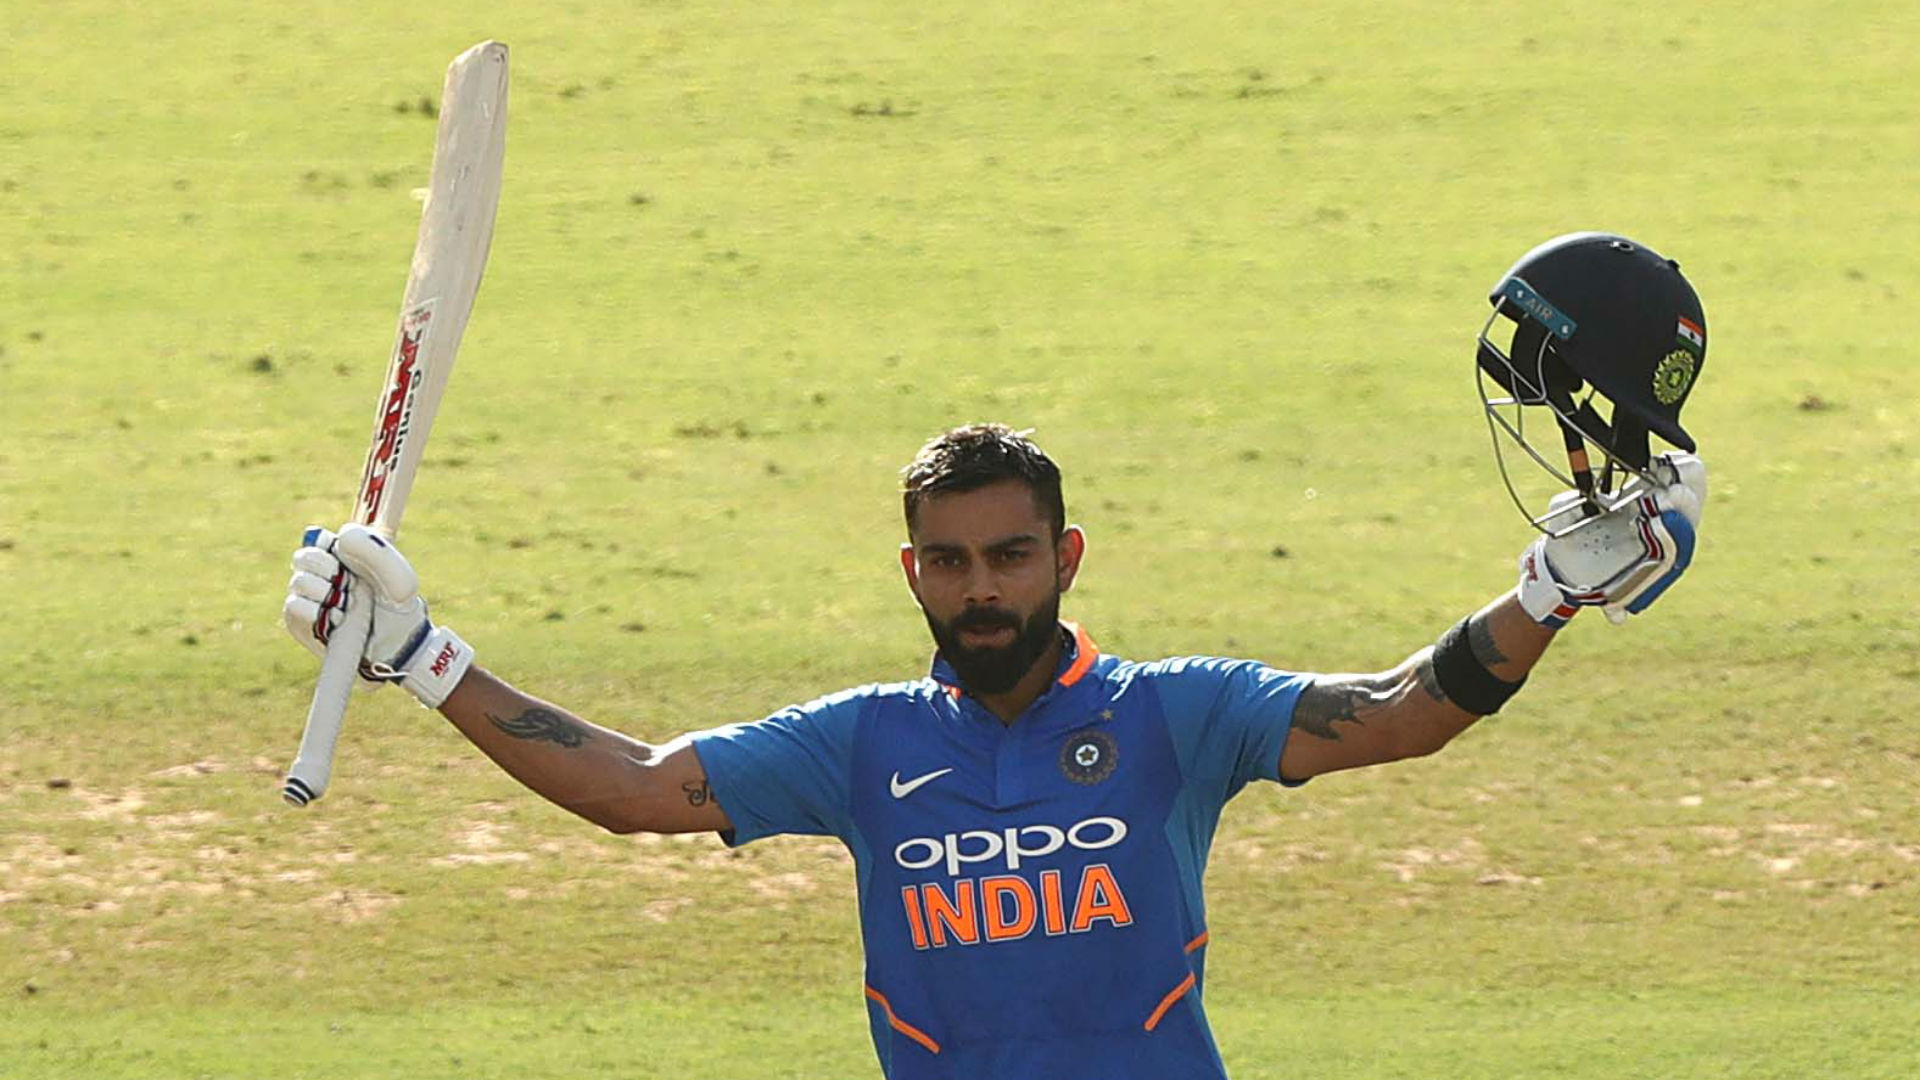 Kohli smashes Tendulkar's record as fastest man to 11,000 ODI runs